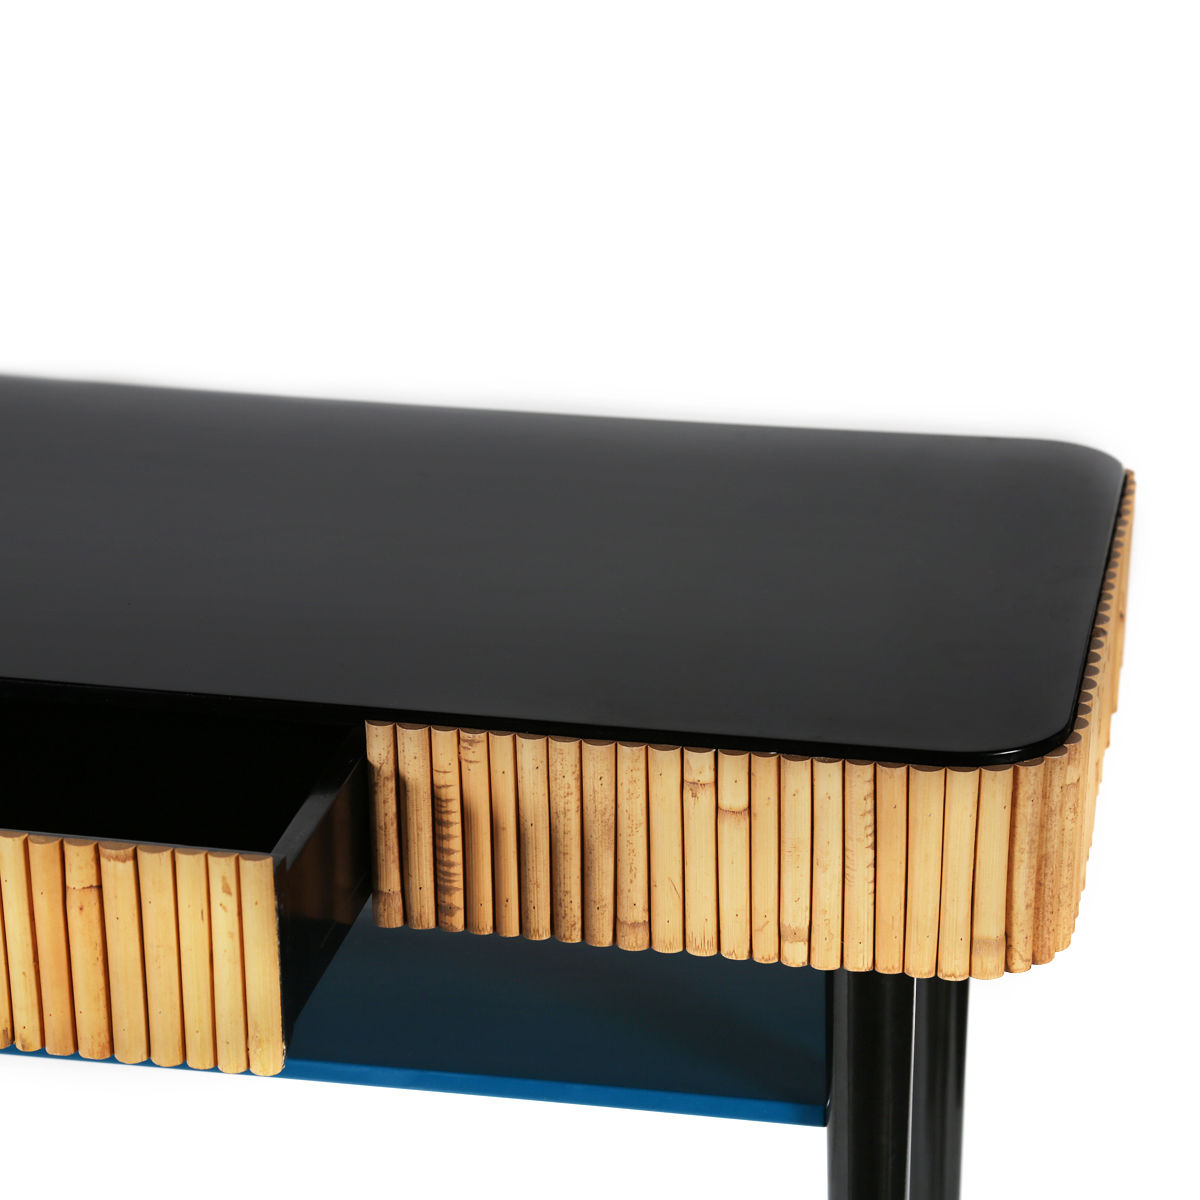 Riviera Console - / Rattan - Drawermaison Sarah Lavoine regarding Natural Cane Media Console Tables (Image 23 of 30)